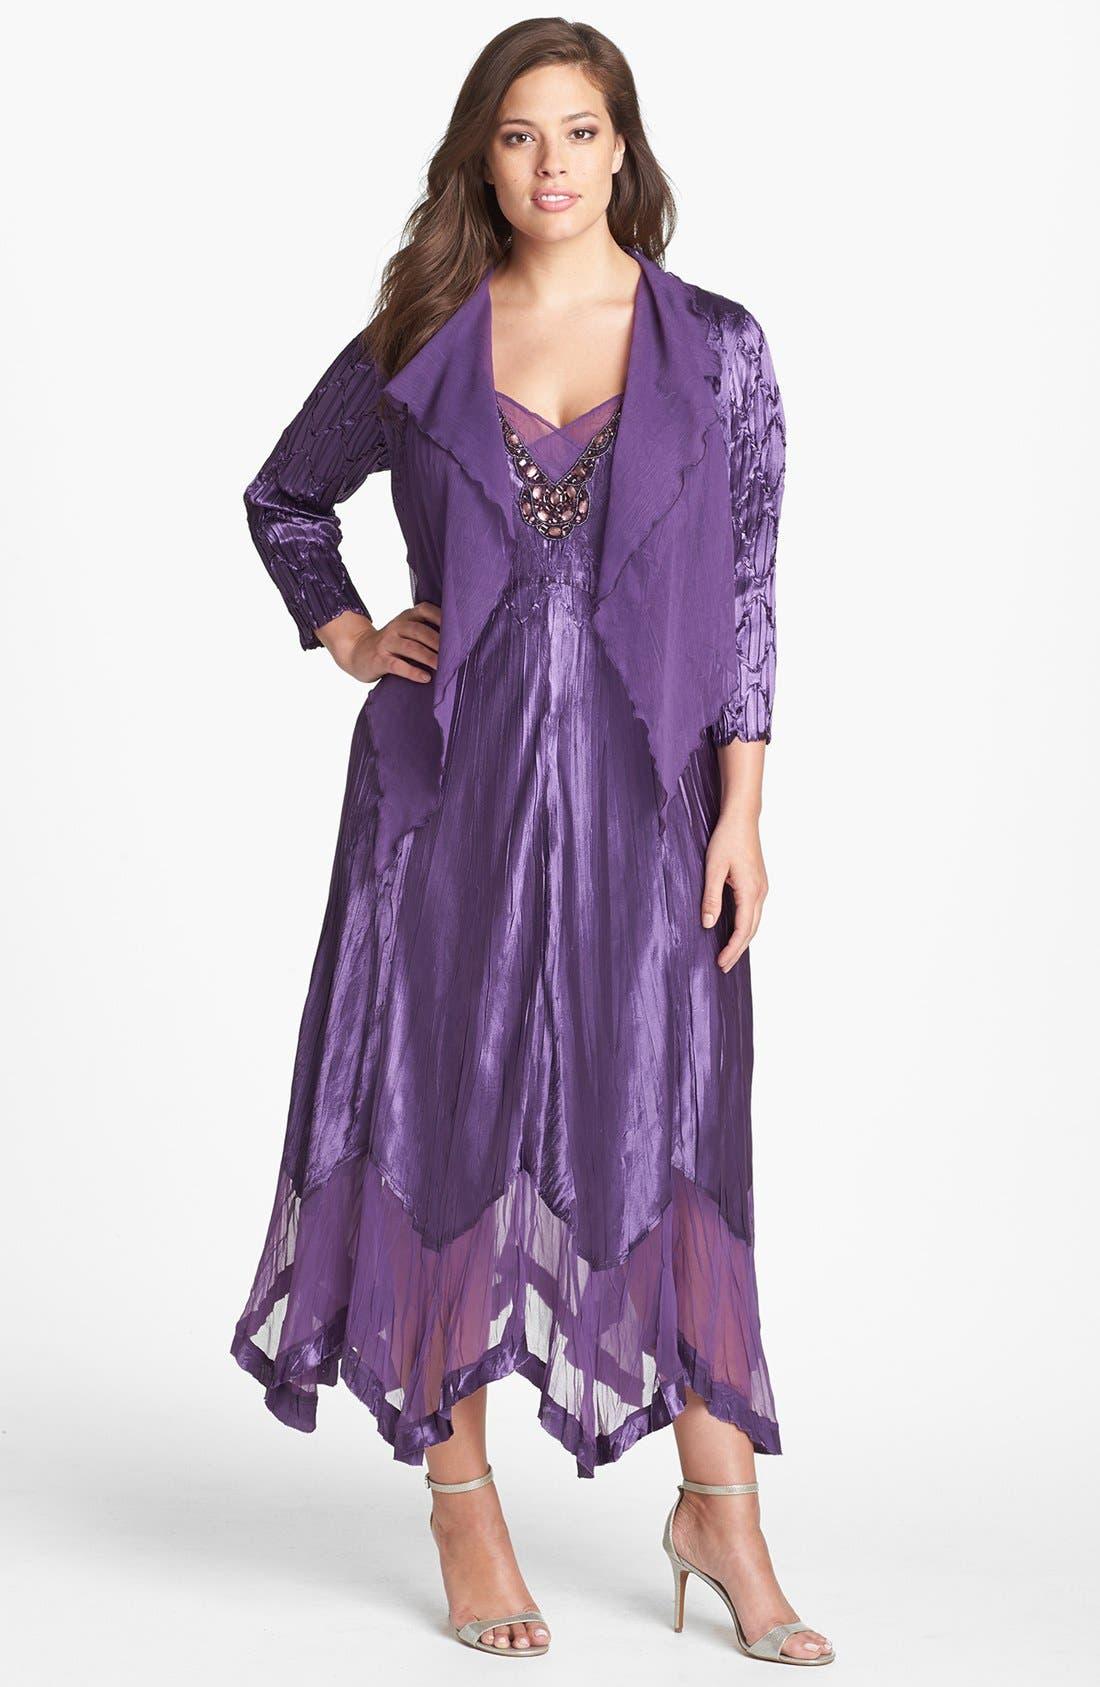 Main Image - Komarov Chiffon Trim Charmeuse Dress & Jacket (Plus Size)